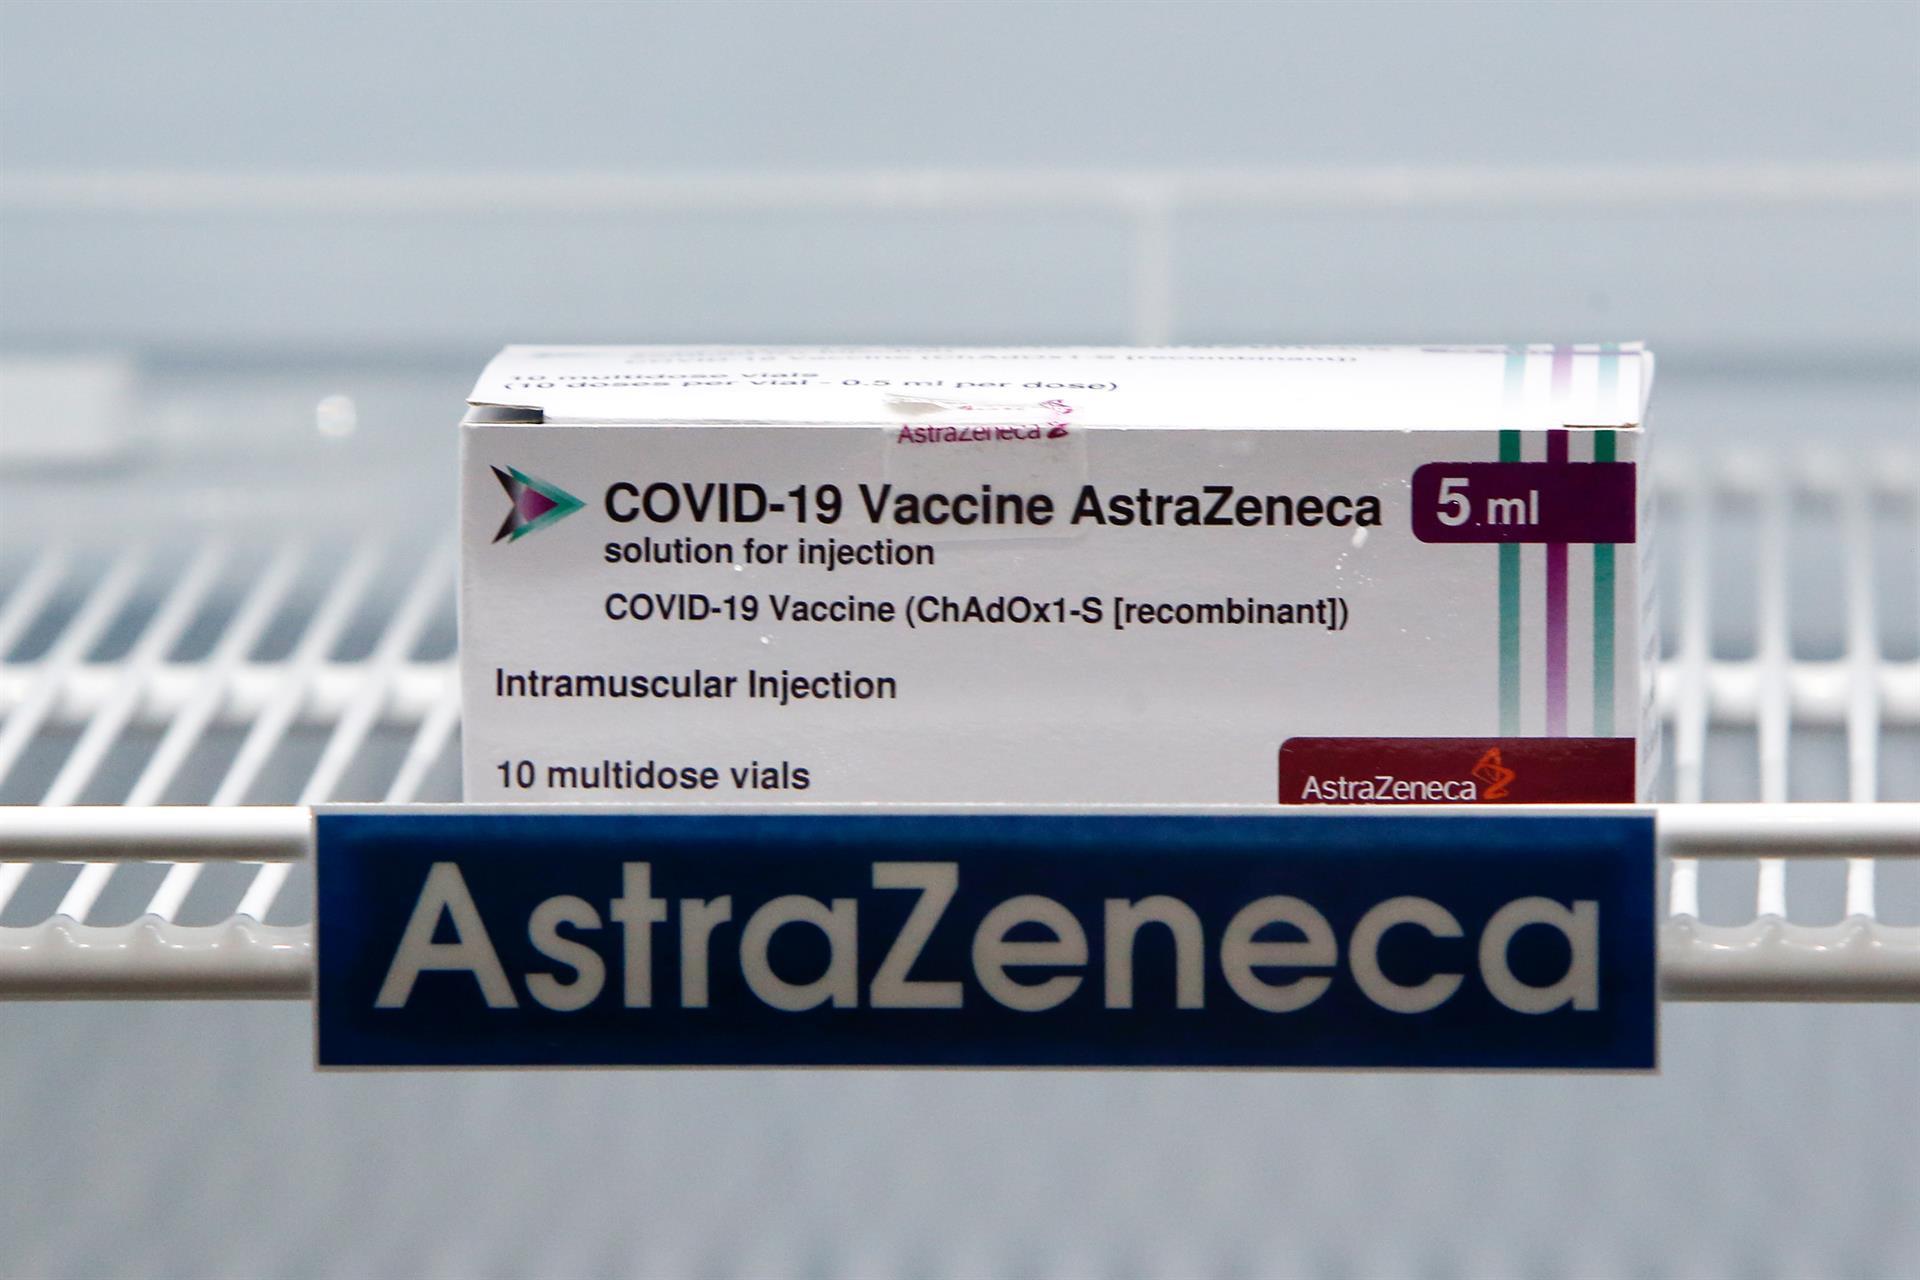 Vacuna de AstraZeneca